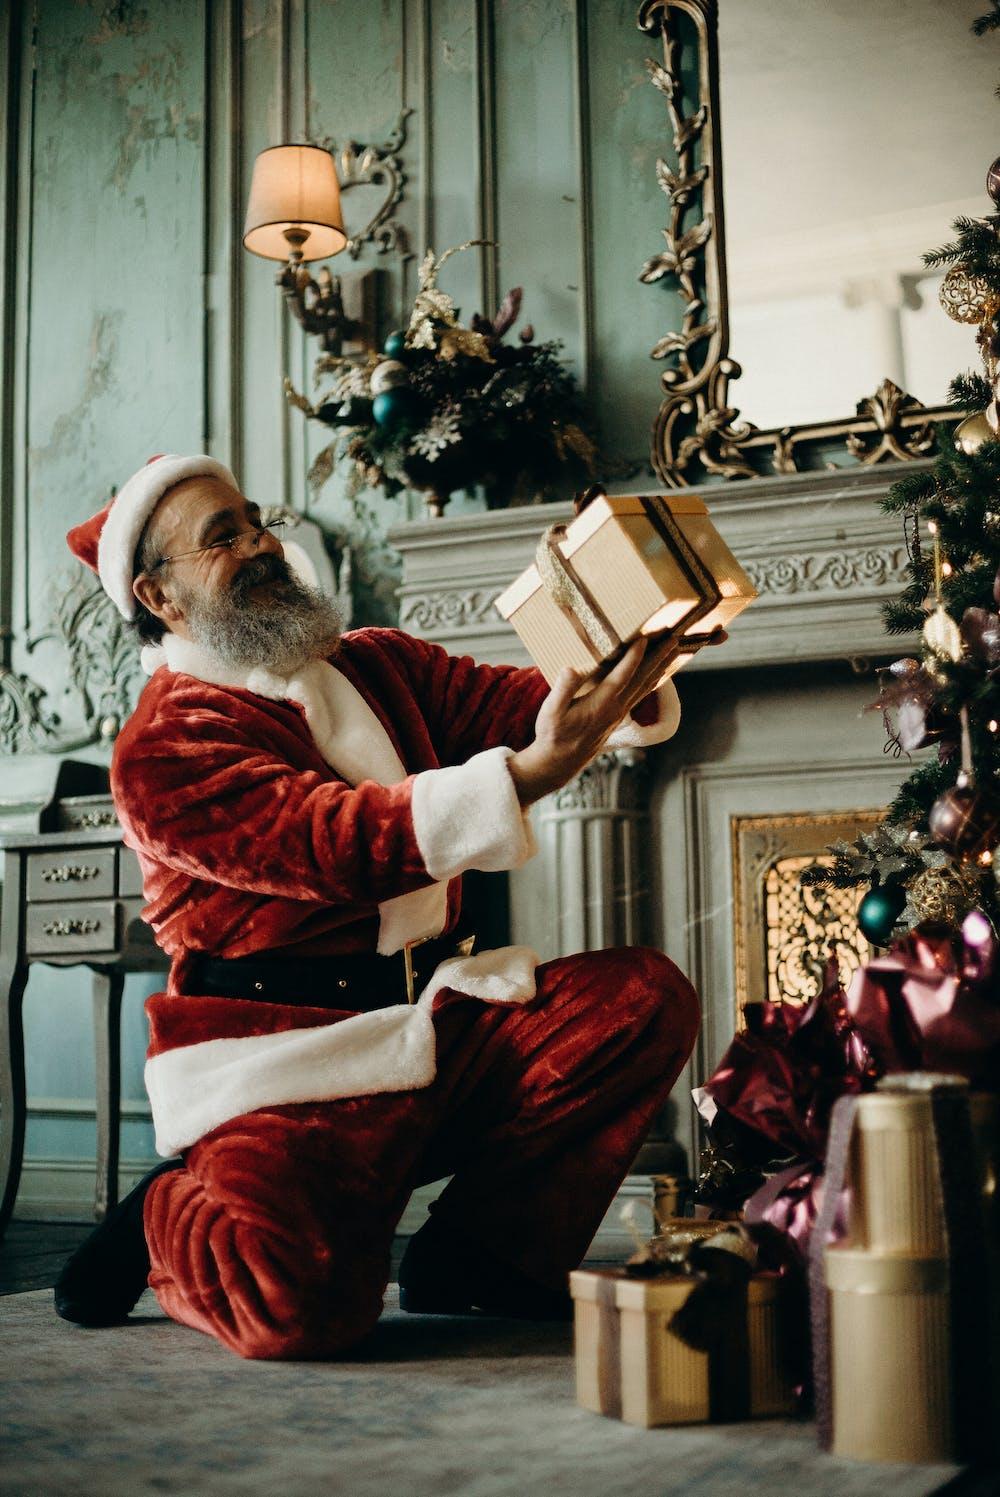 Santa Claus holding a gift box. | Photo: Pexels